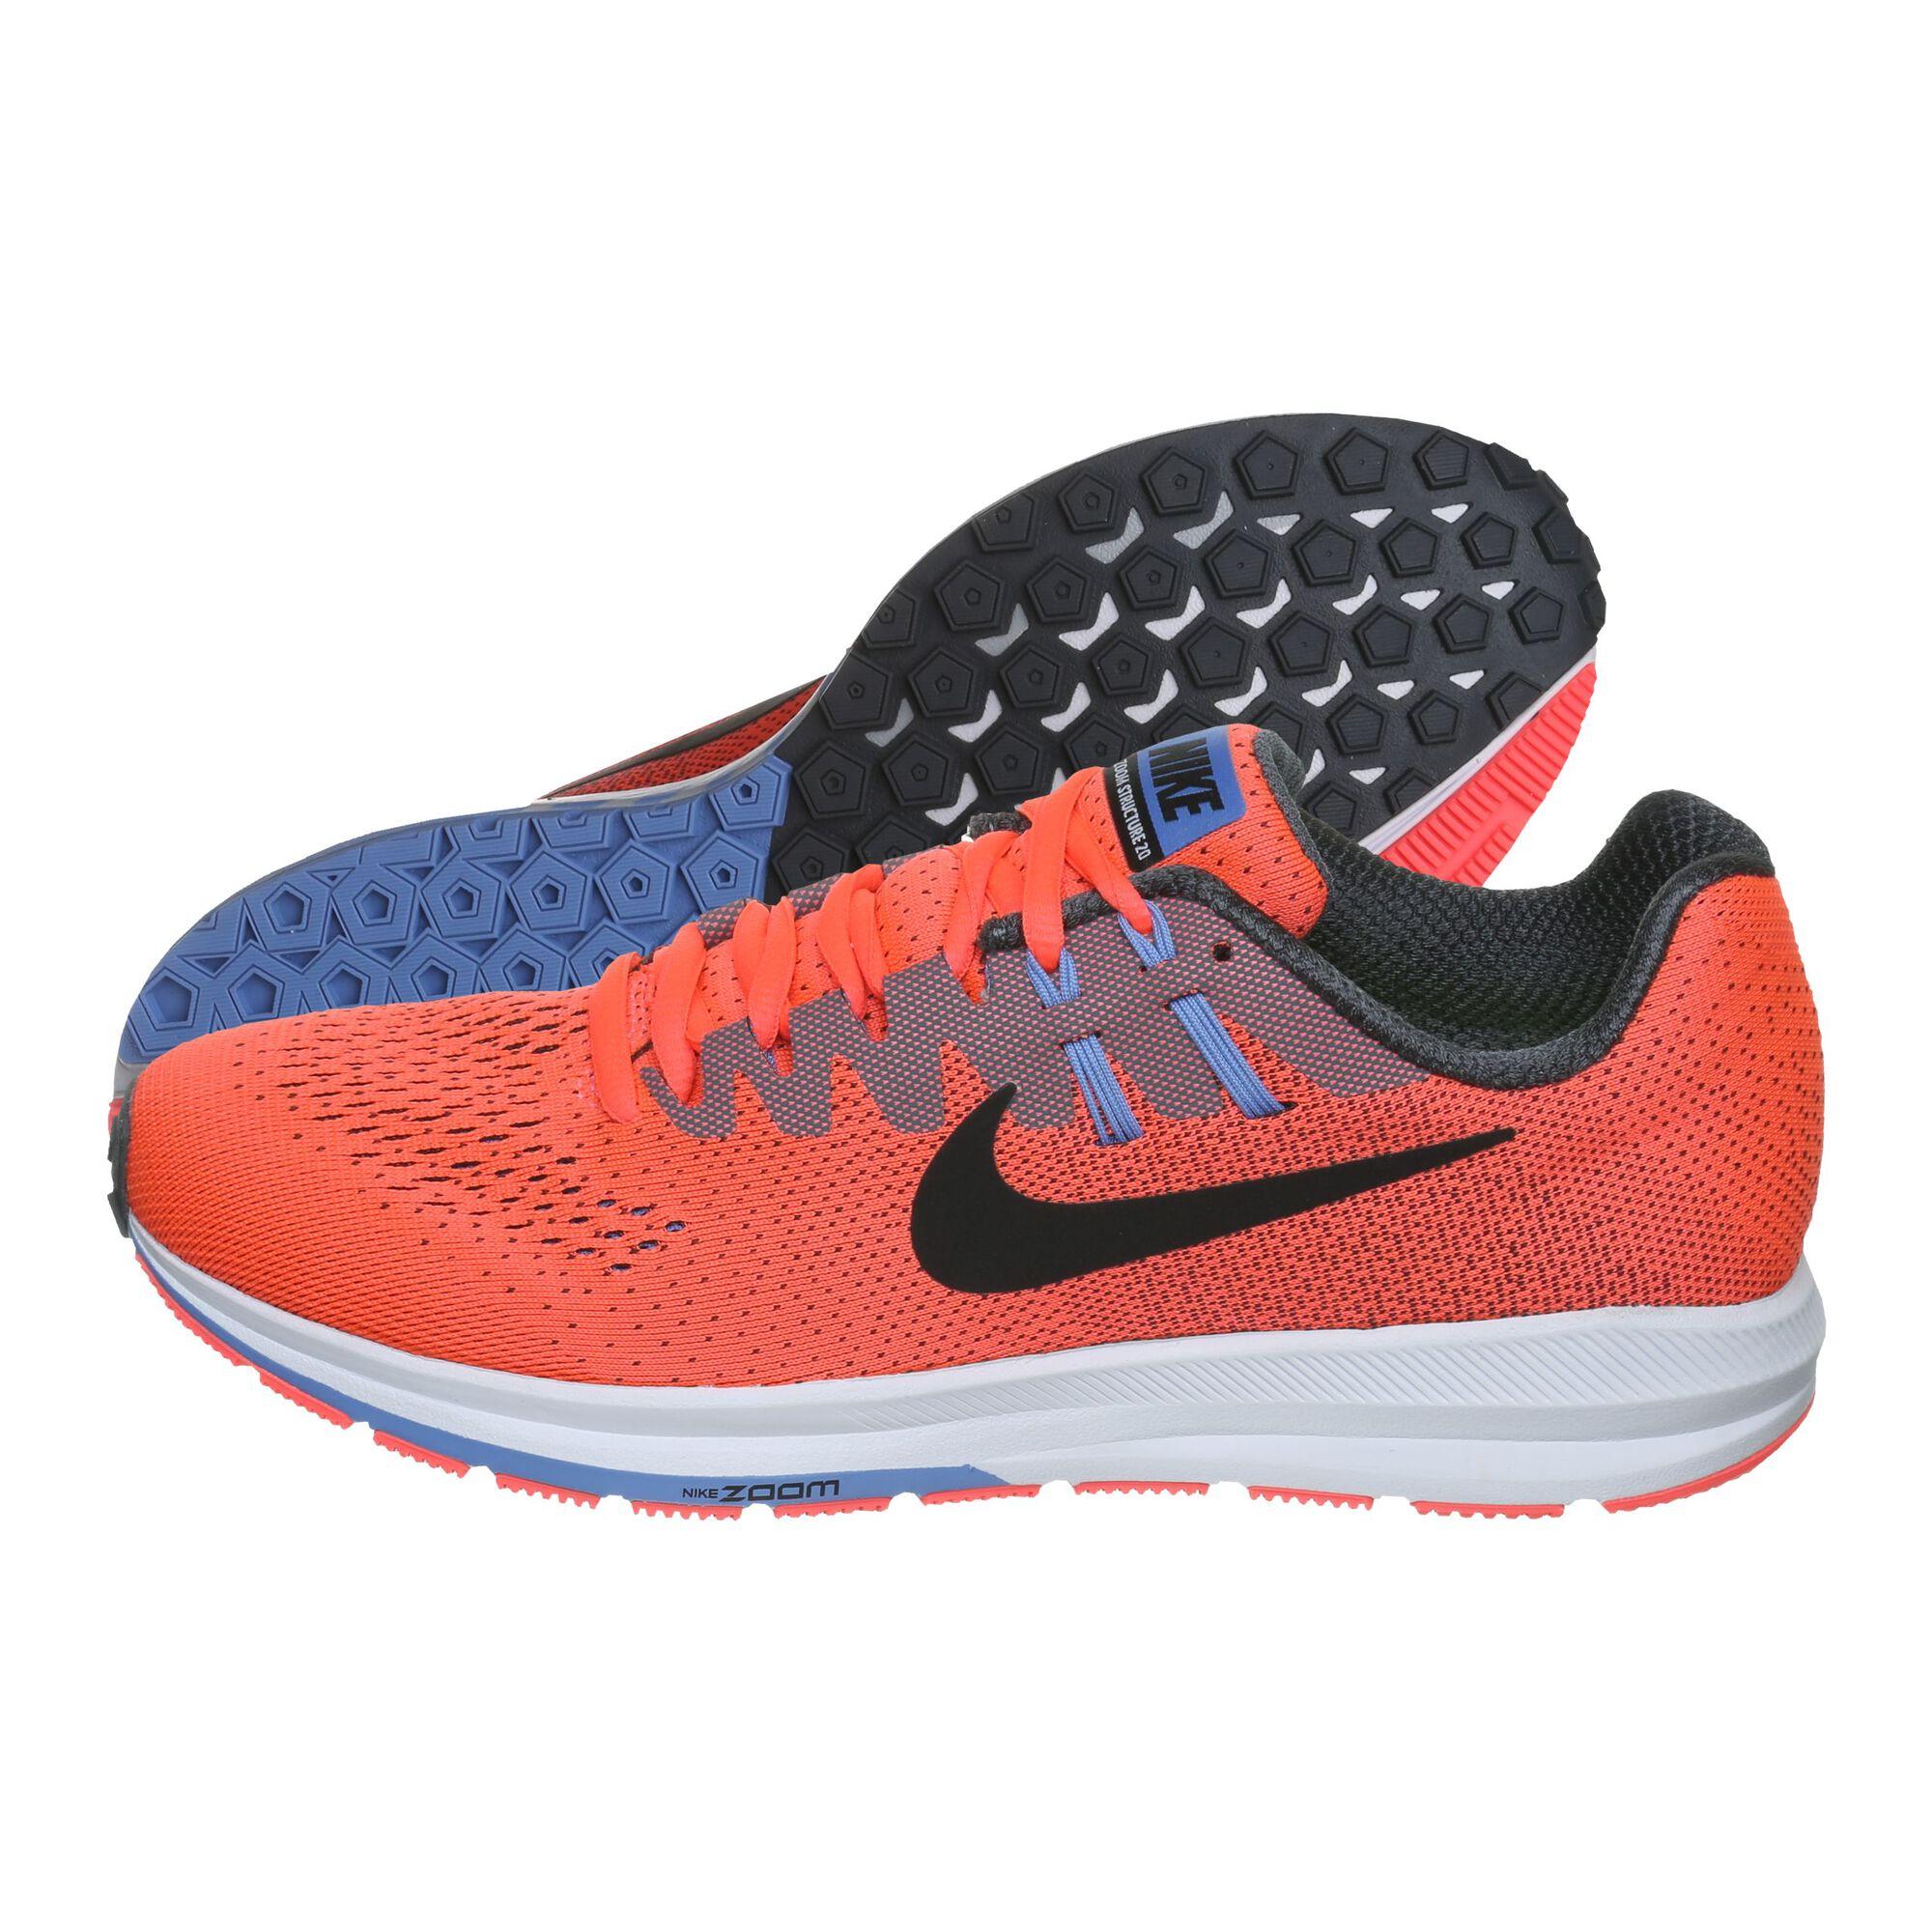 free shipping bffb2 a88b1 ... Nike  Nike  Nike  Nike  Nike  Nike. Air Zoom Structure 20 Women ...